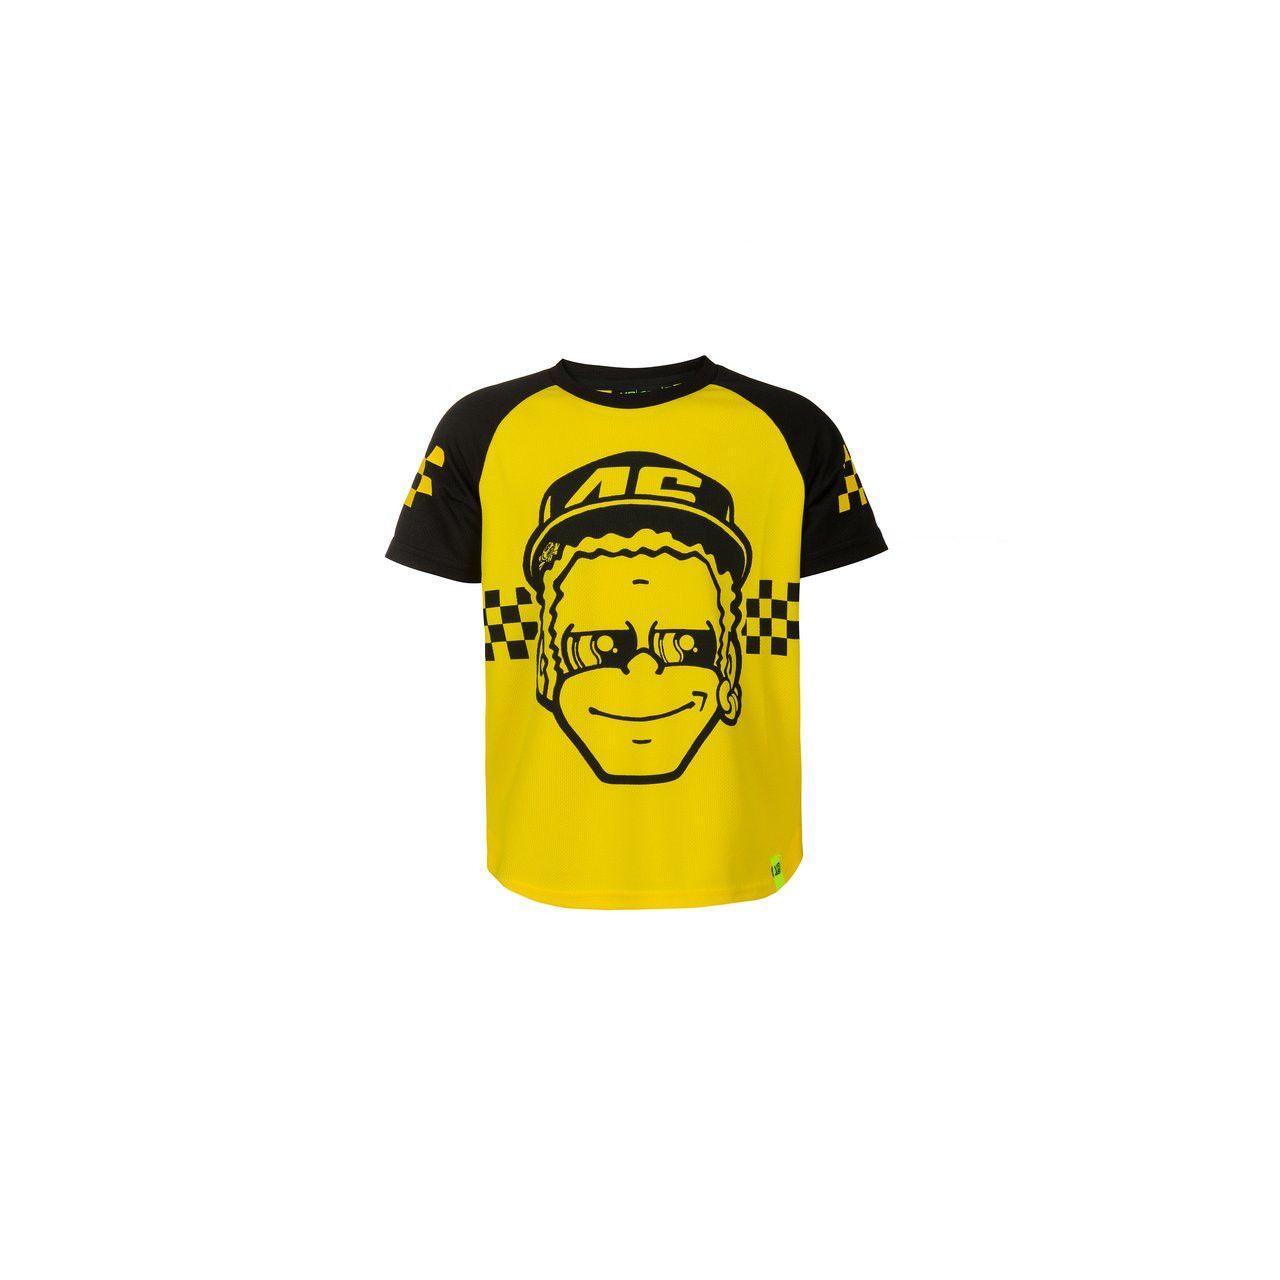 VALENTINO ROSSI T-shirt enfant VR46 2020 Dottorone